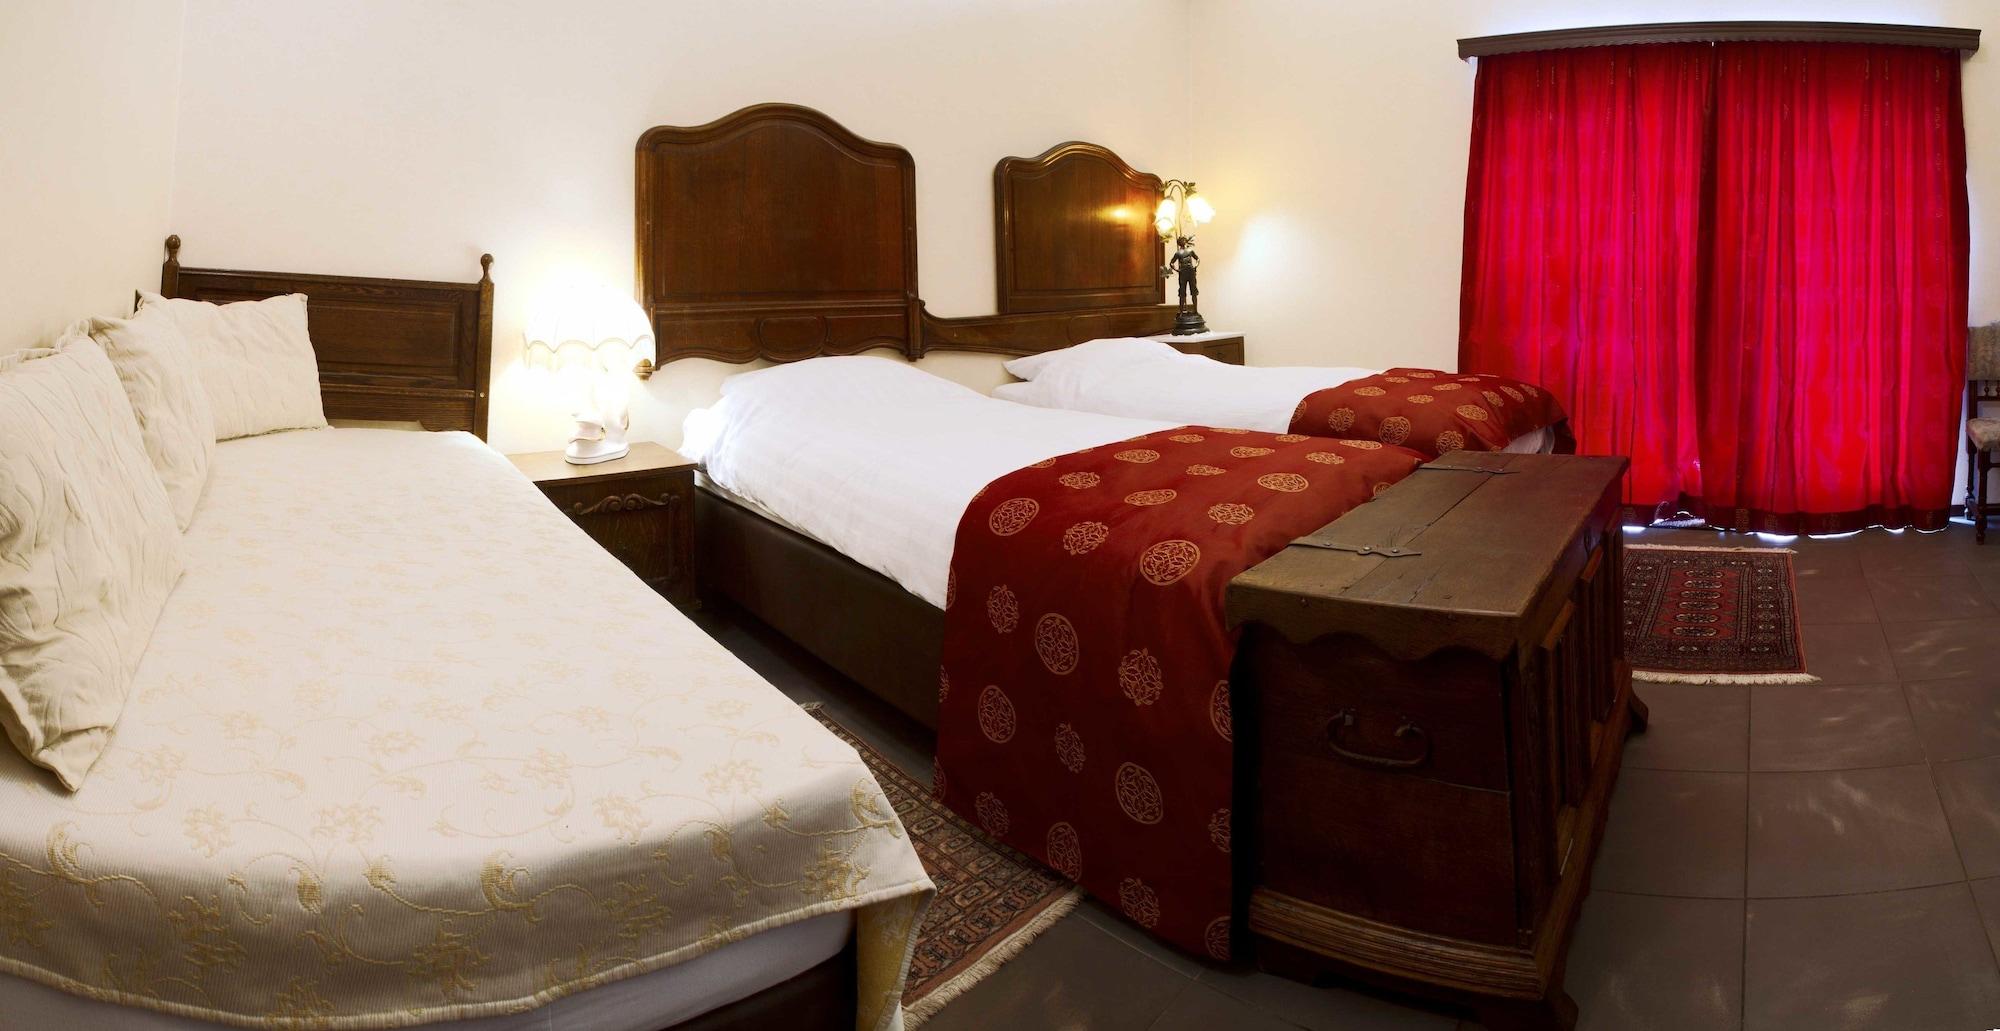 Country Hotel Anna, Vestur-Eyjafjallahreppur